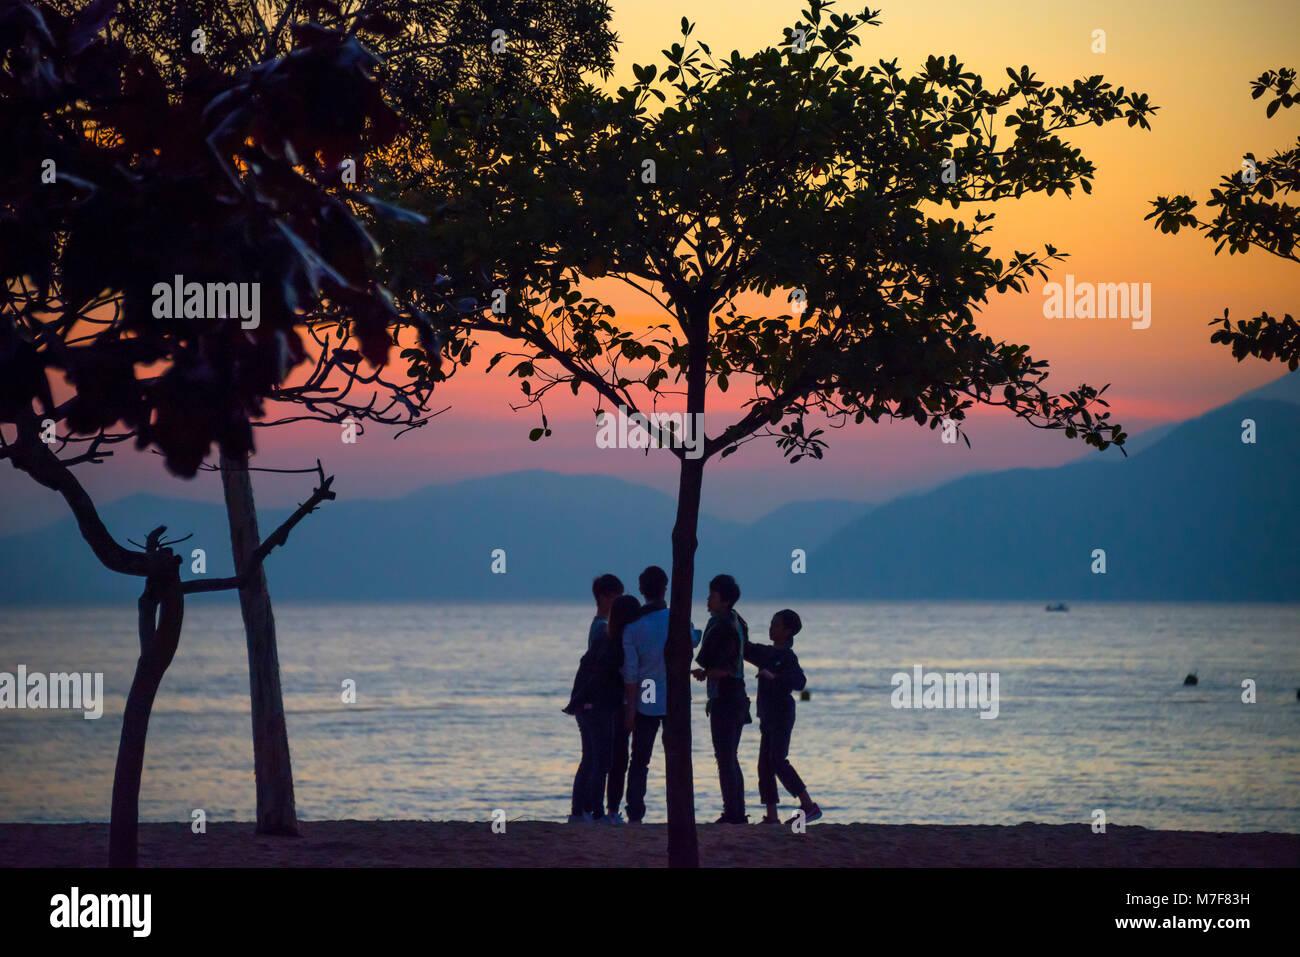 Children playing at Sunset, Repulse Bay, Hong Kong - Stock Image